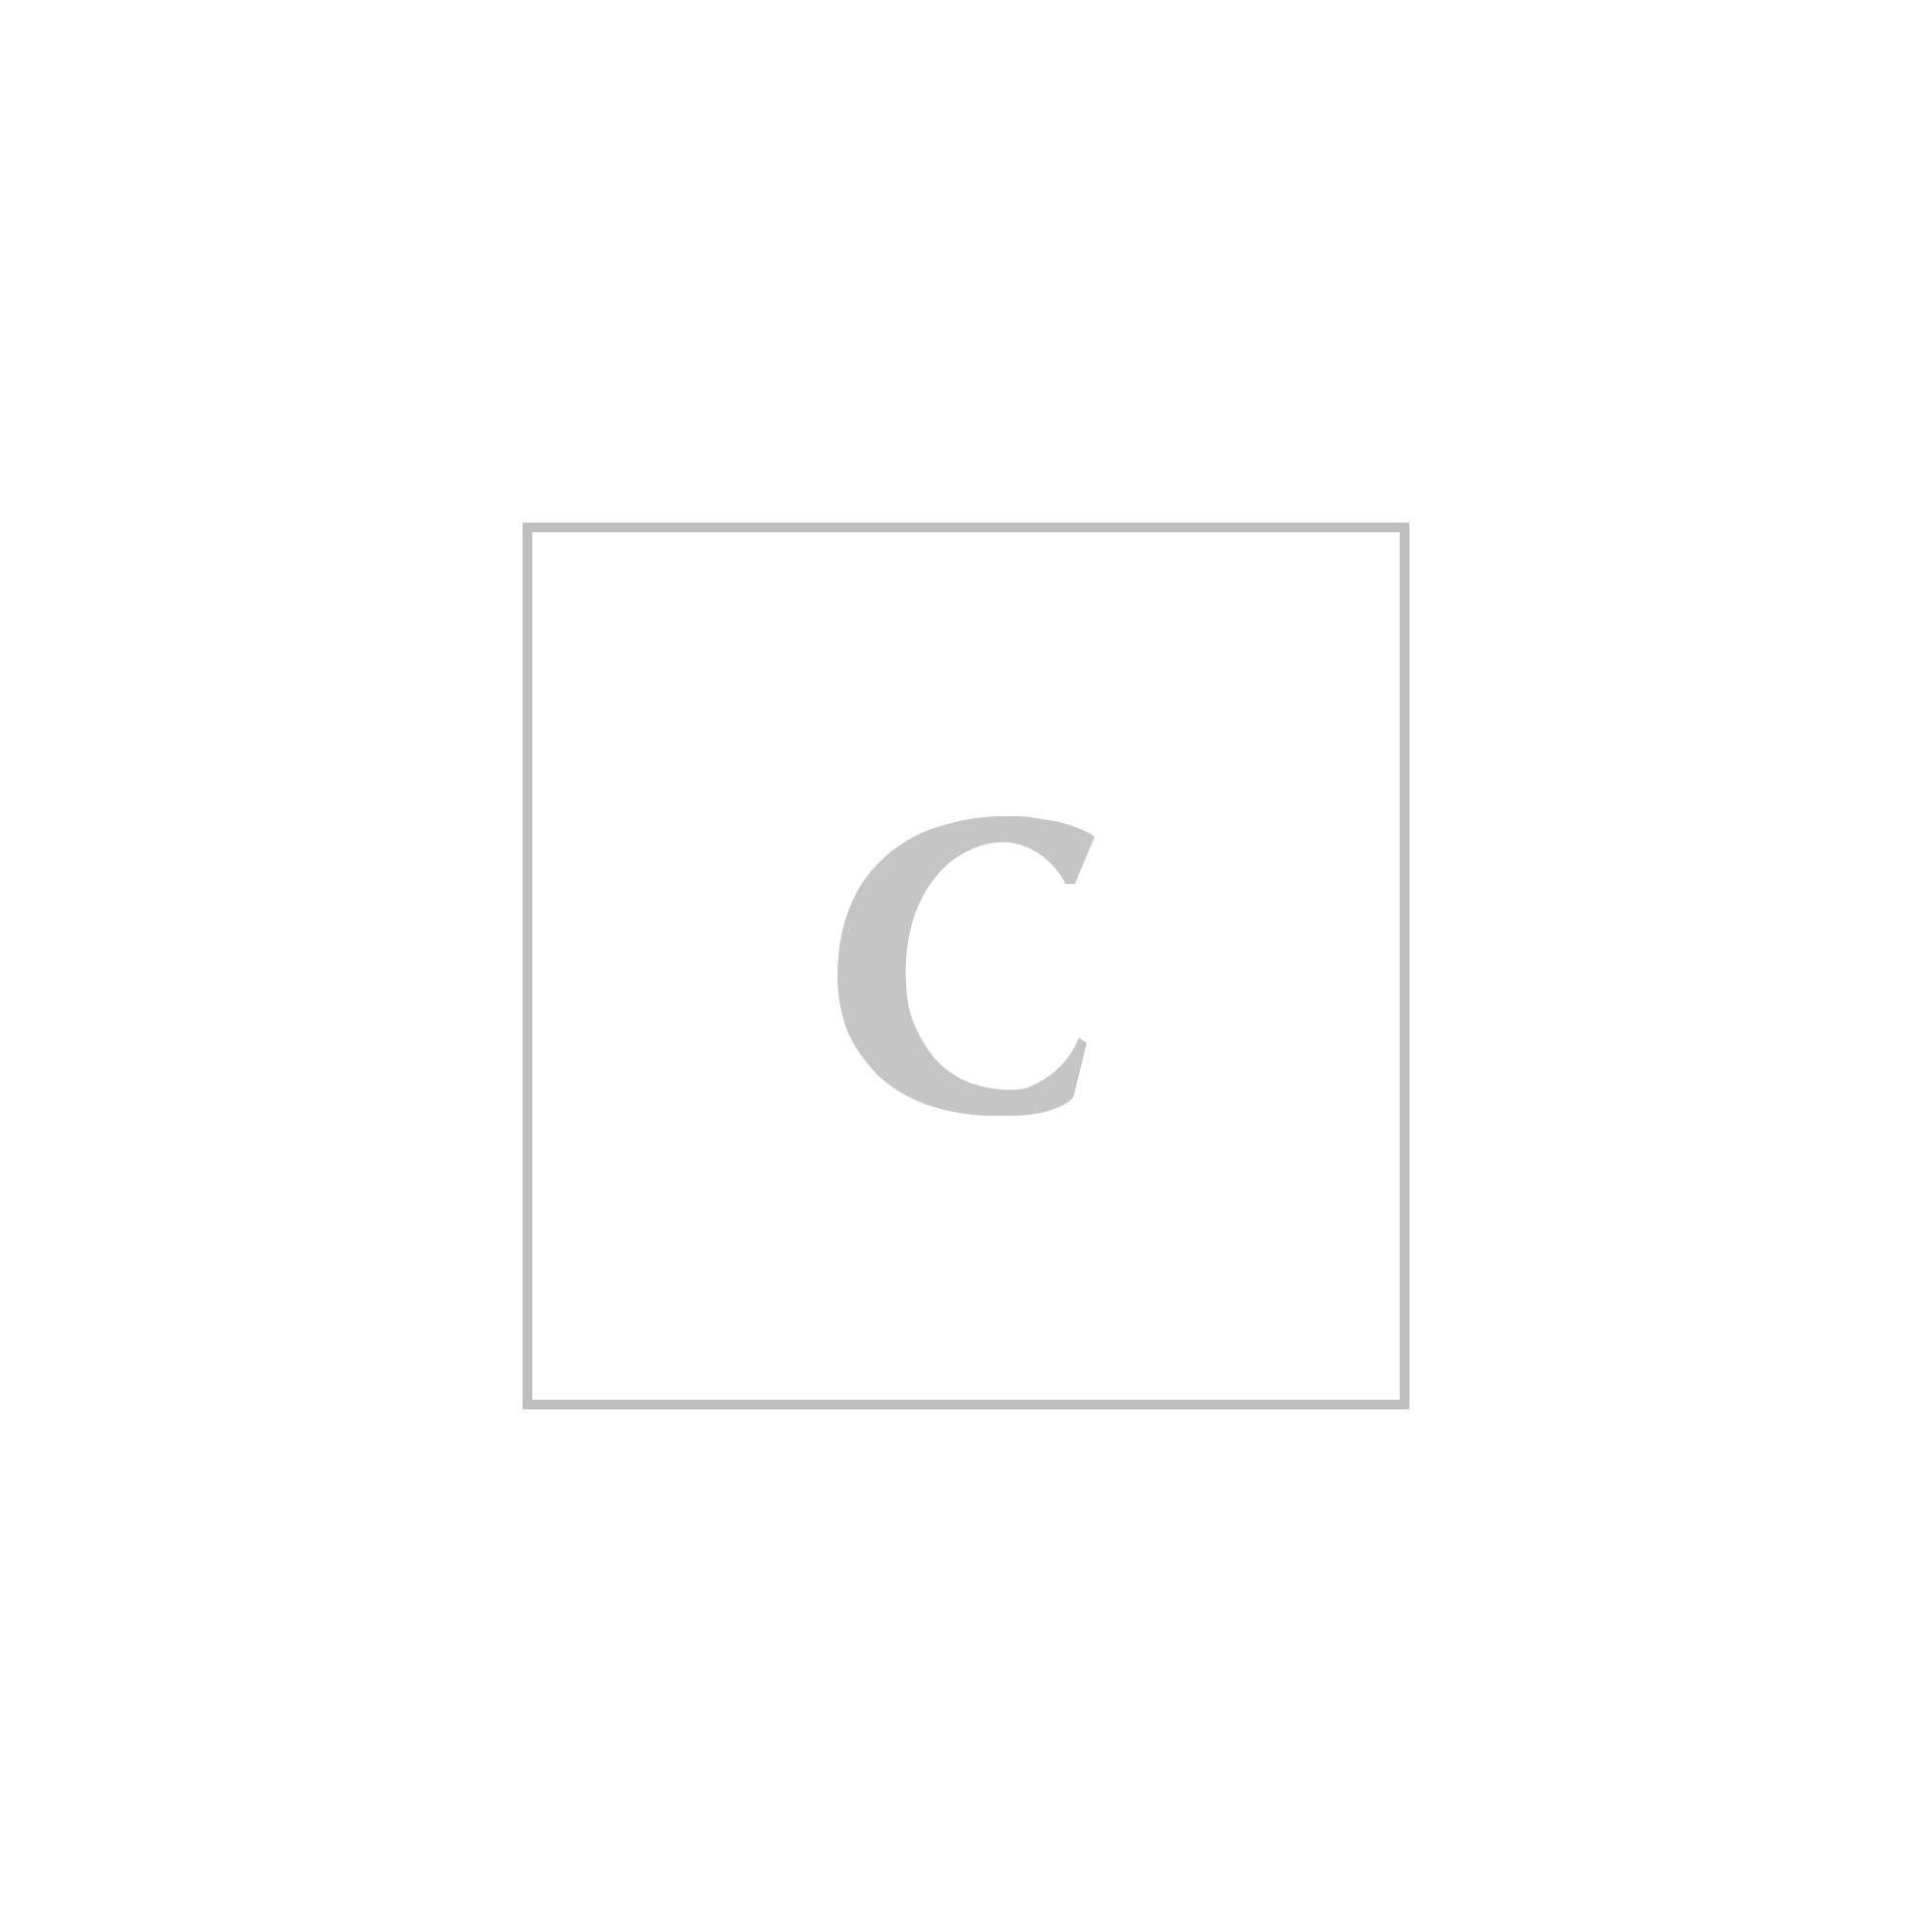 Moncler giubbotto crussol